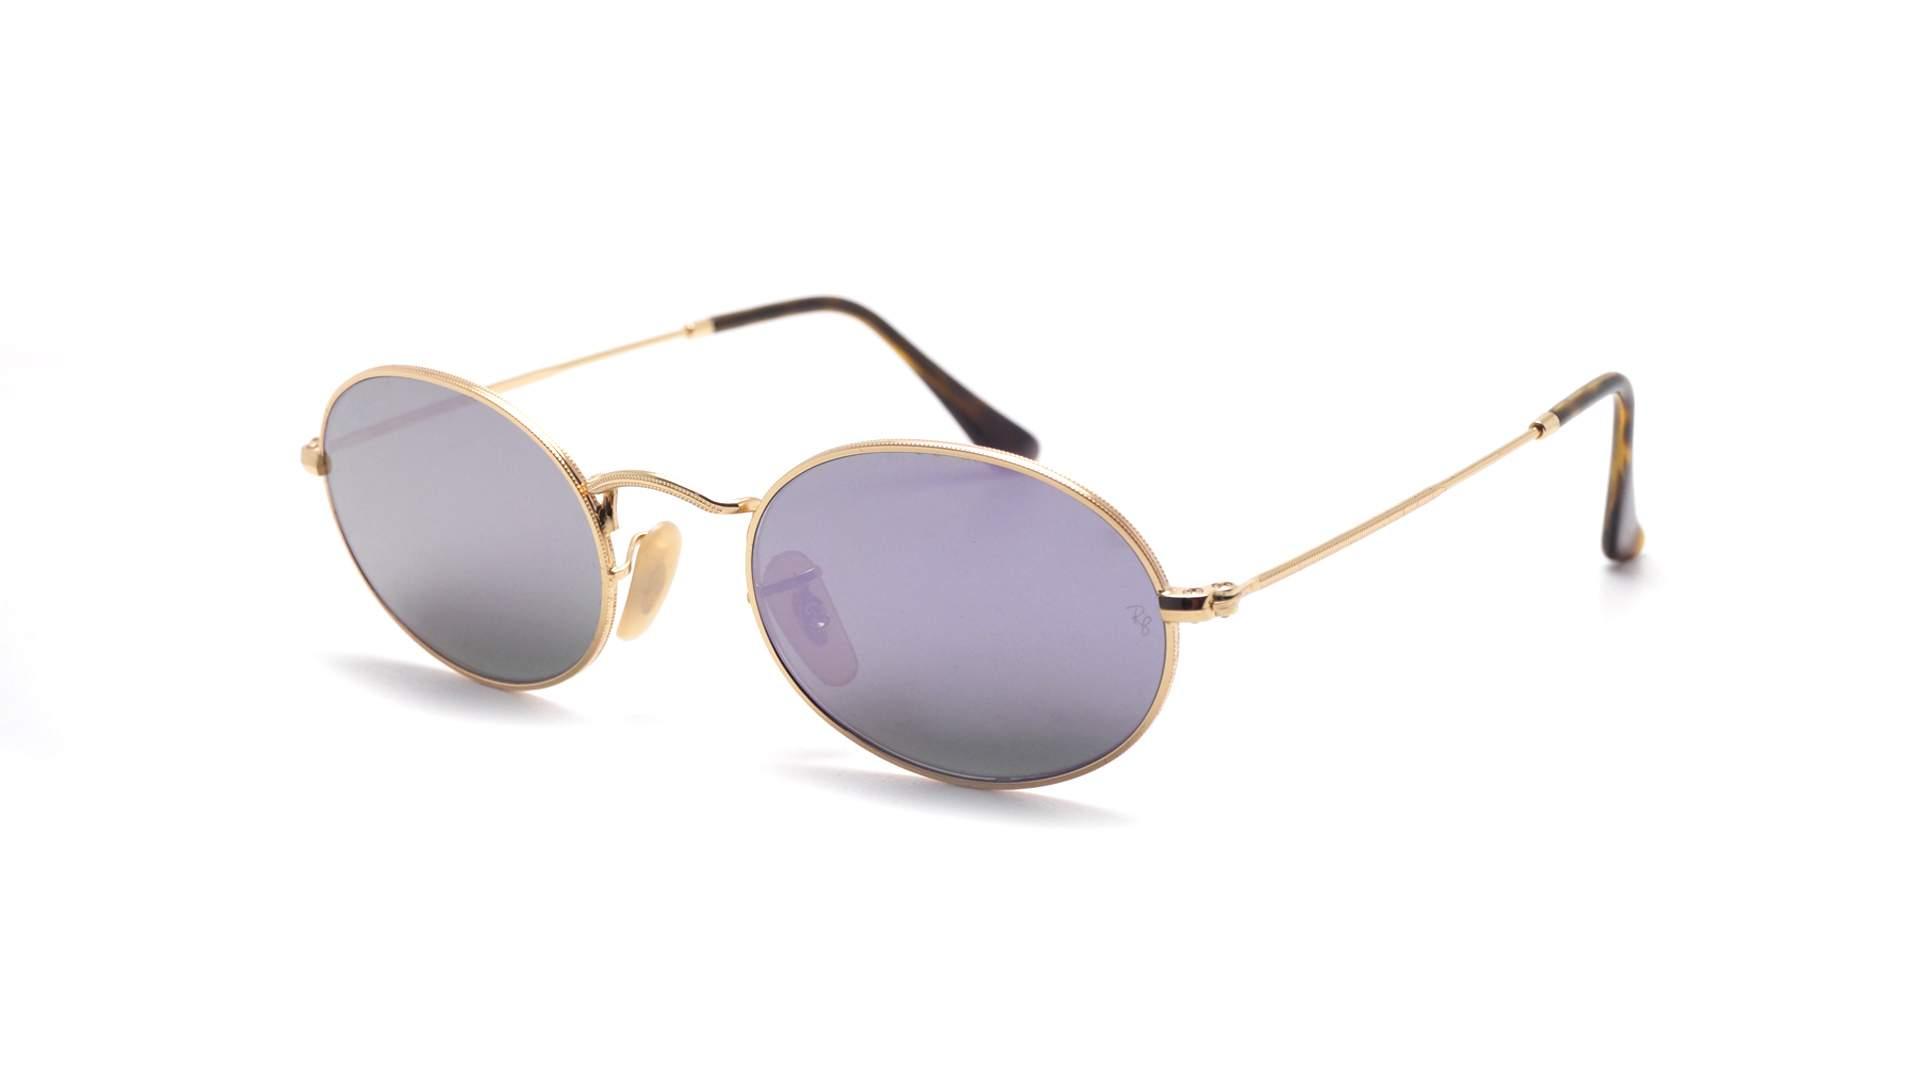 d4d4aed0c6 Sunglasses Ray-Ban Oval Flat Lenses Gold RB3547N 001 8O 51-21 Medium Mirror